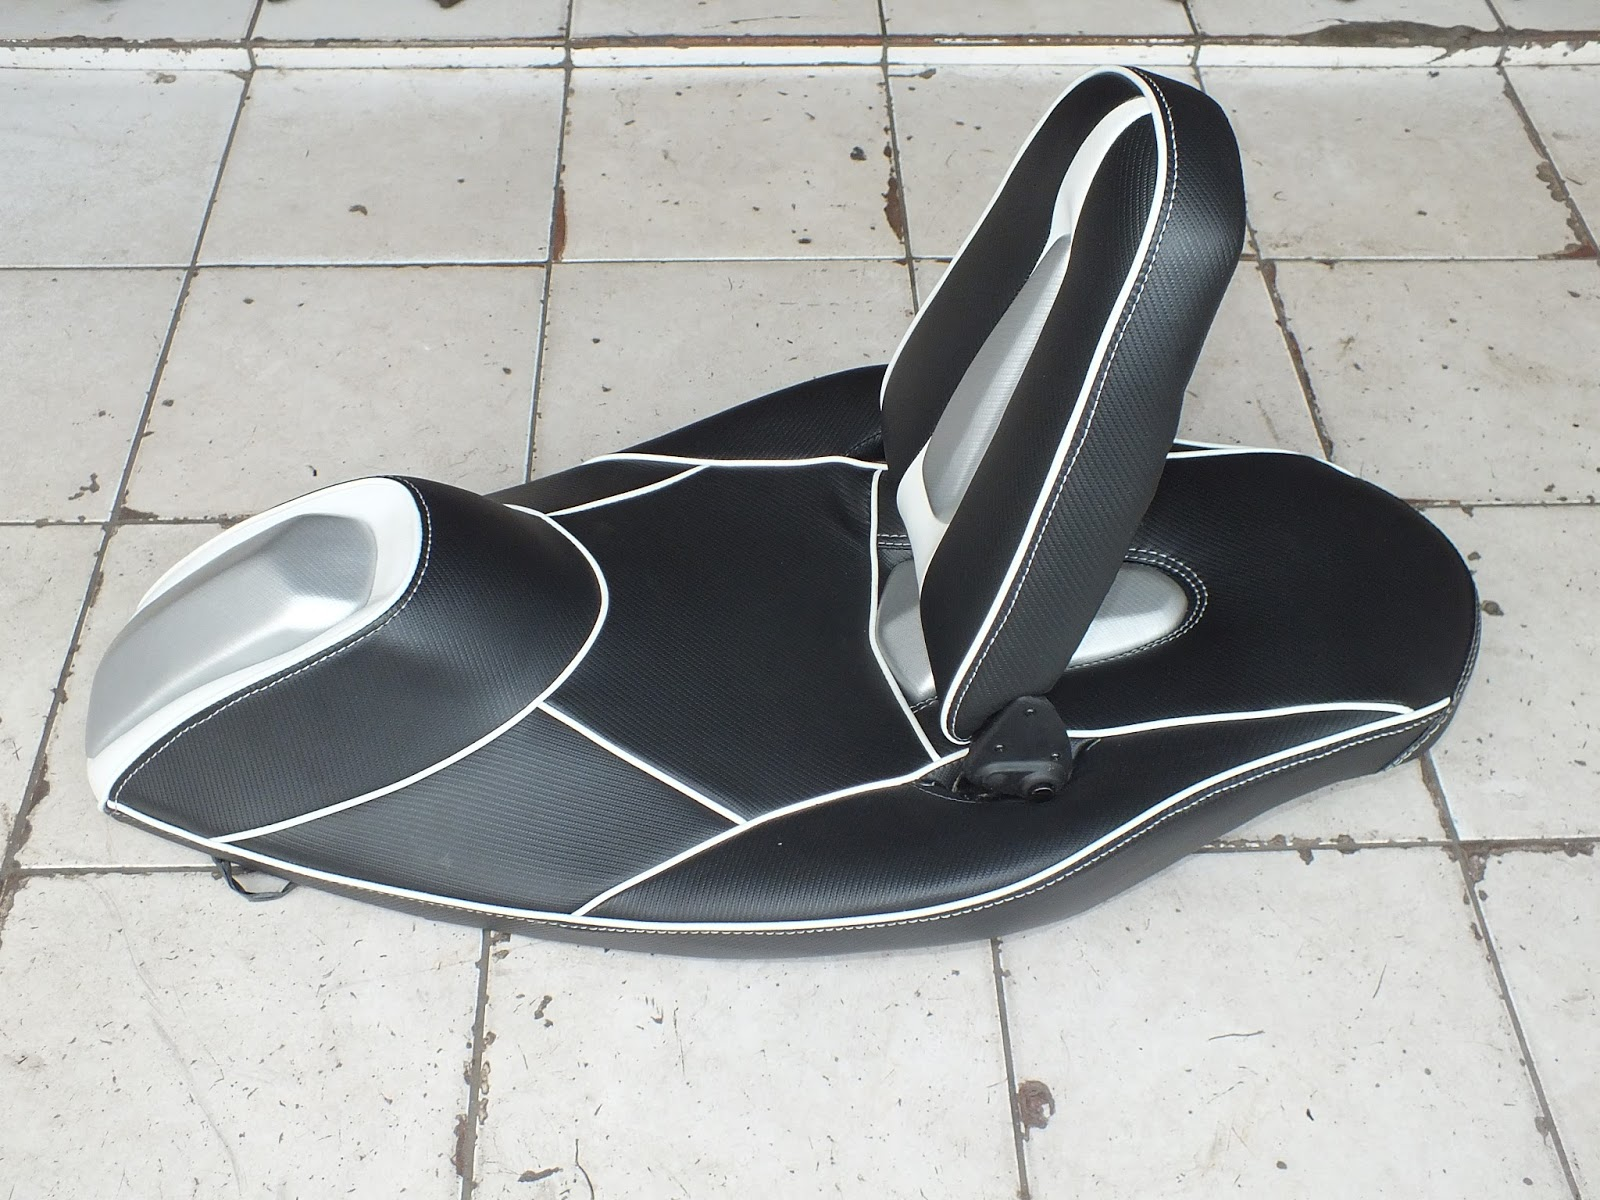 modifikasi jok motor jok yamaha nmax model sandaran lipat